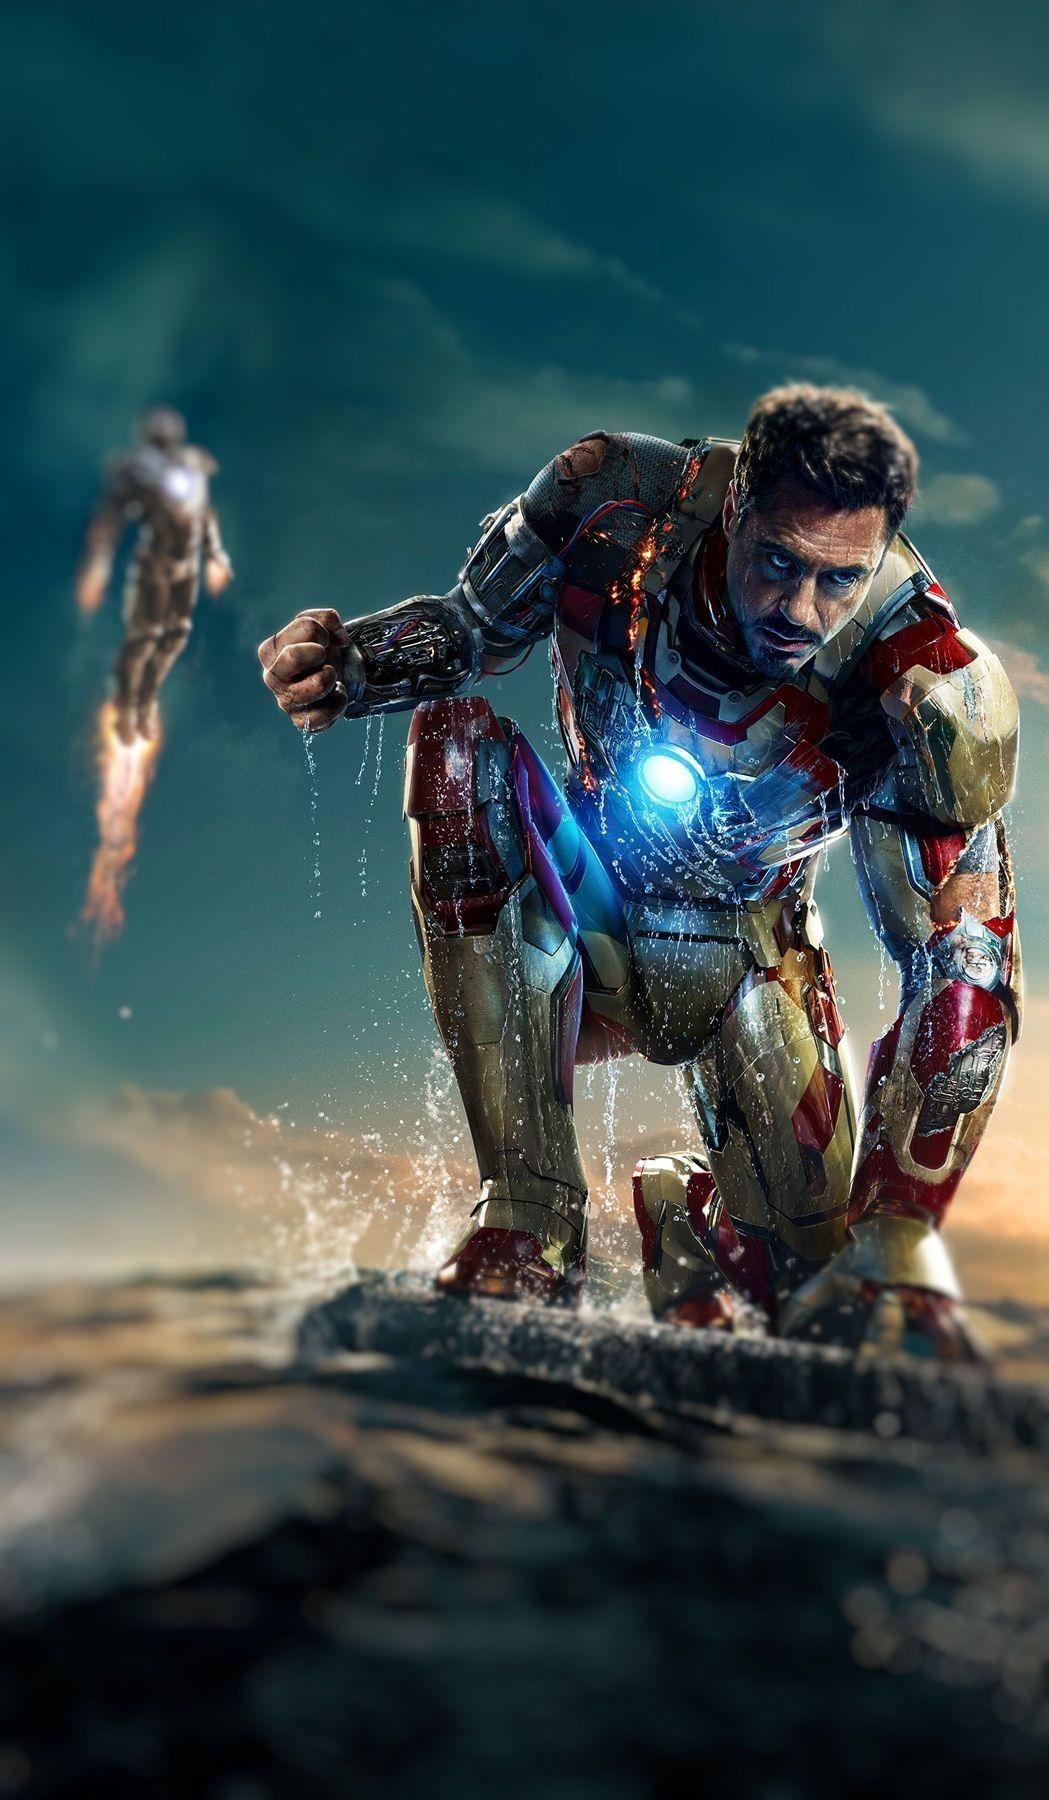 Robert Downey Jr Iron Man Iron Man Wallpaper Iron Man Hd Wallpaper Tony Stark Wallpaper